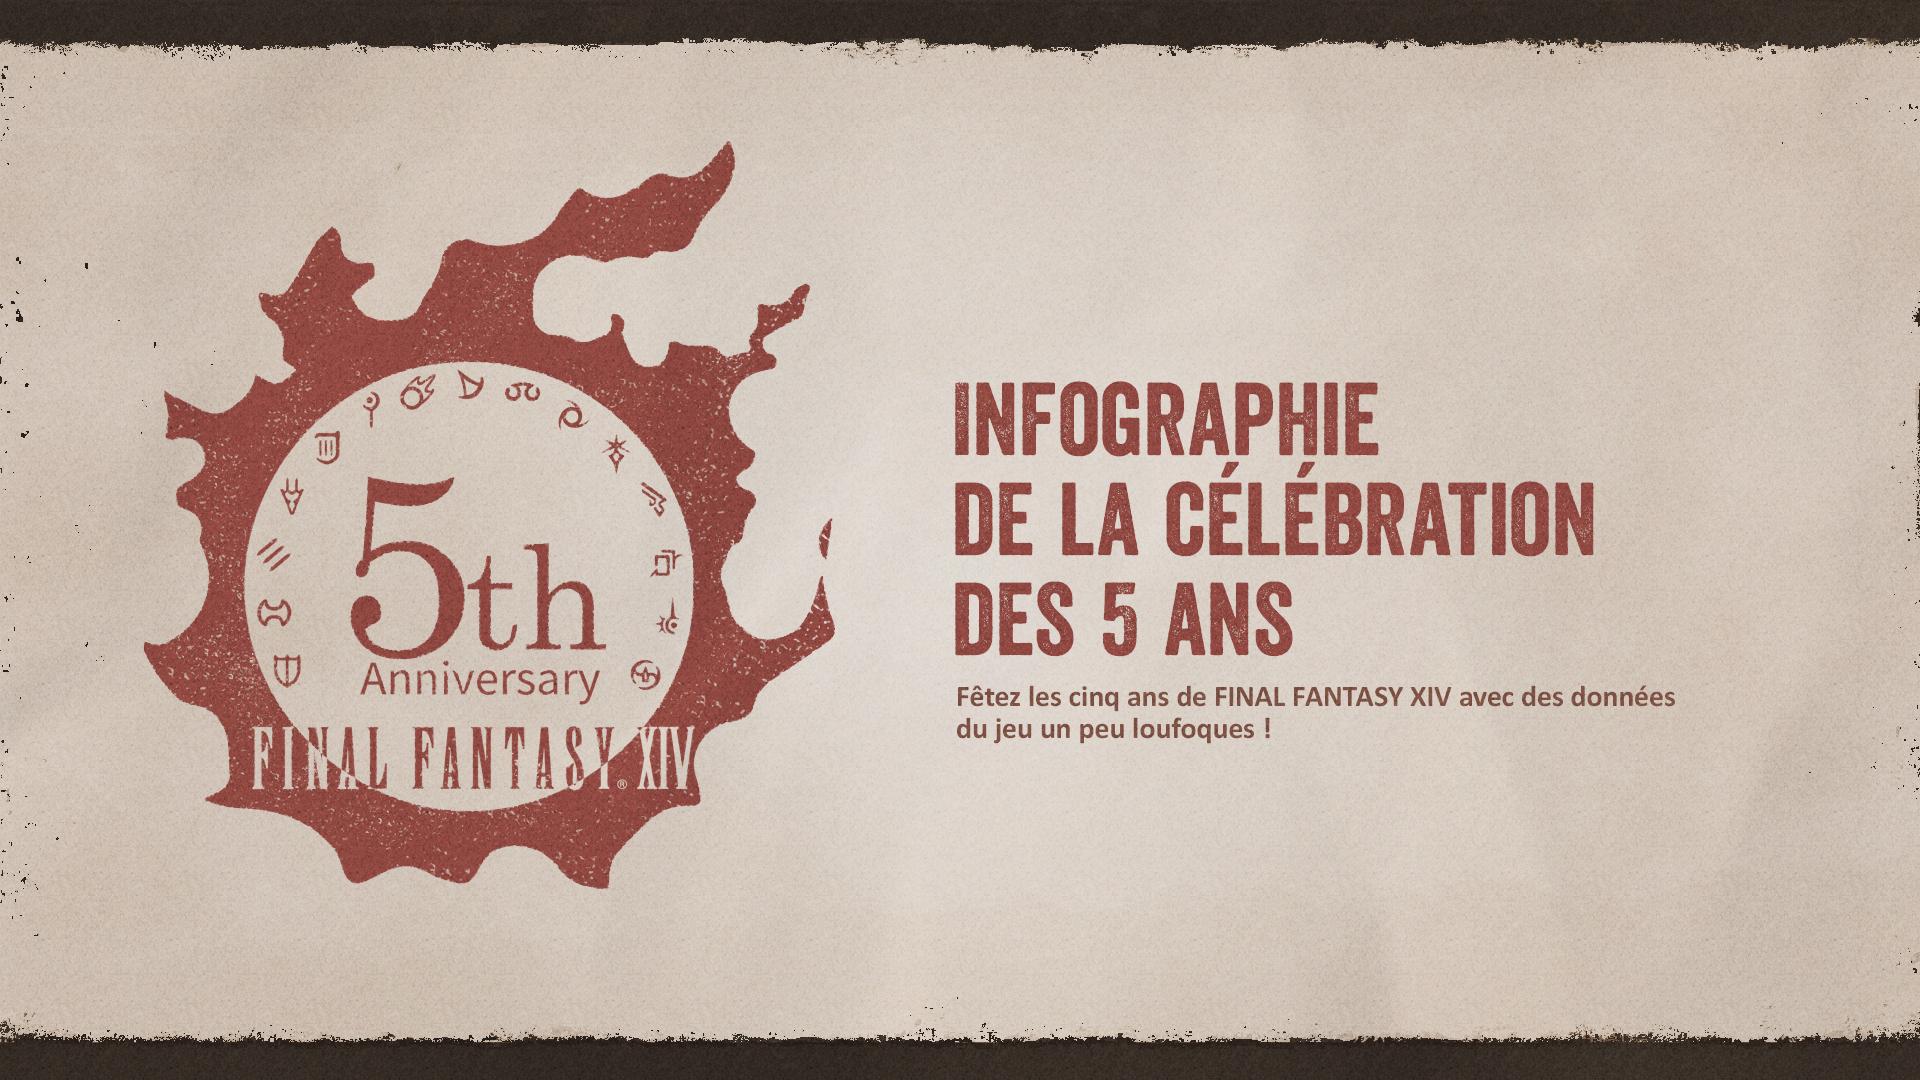 Final Fantasy XIV infographie couverture